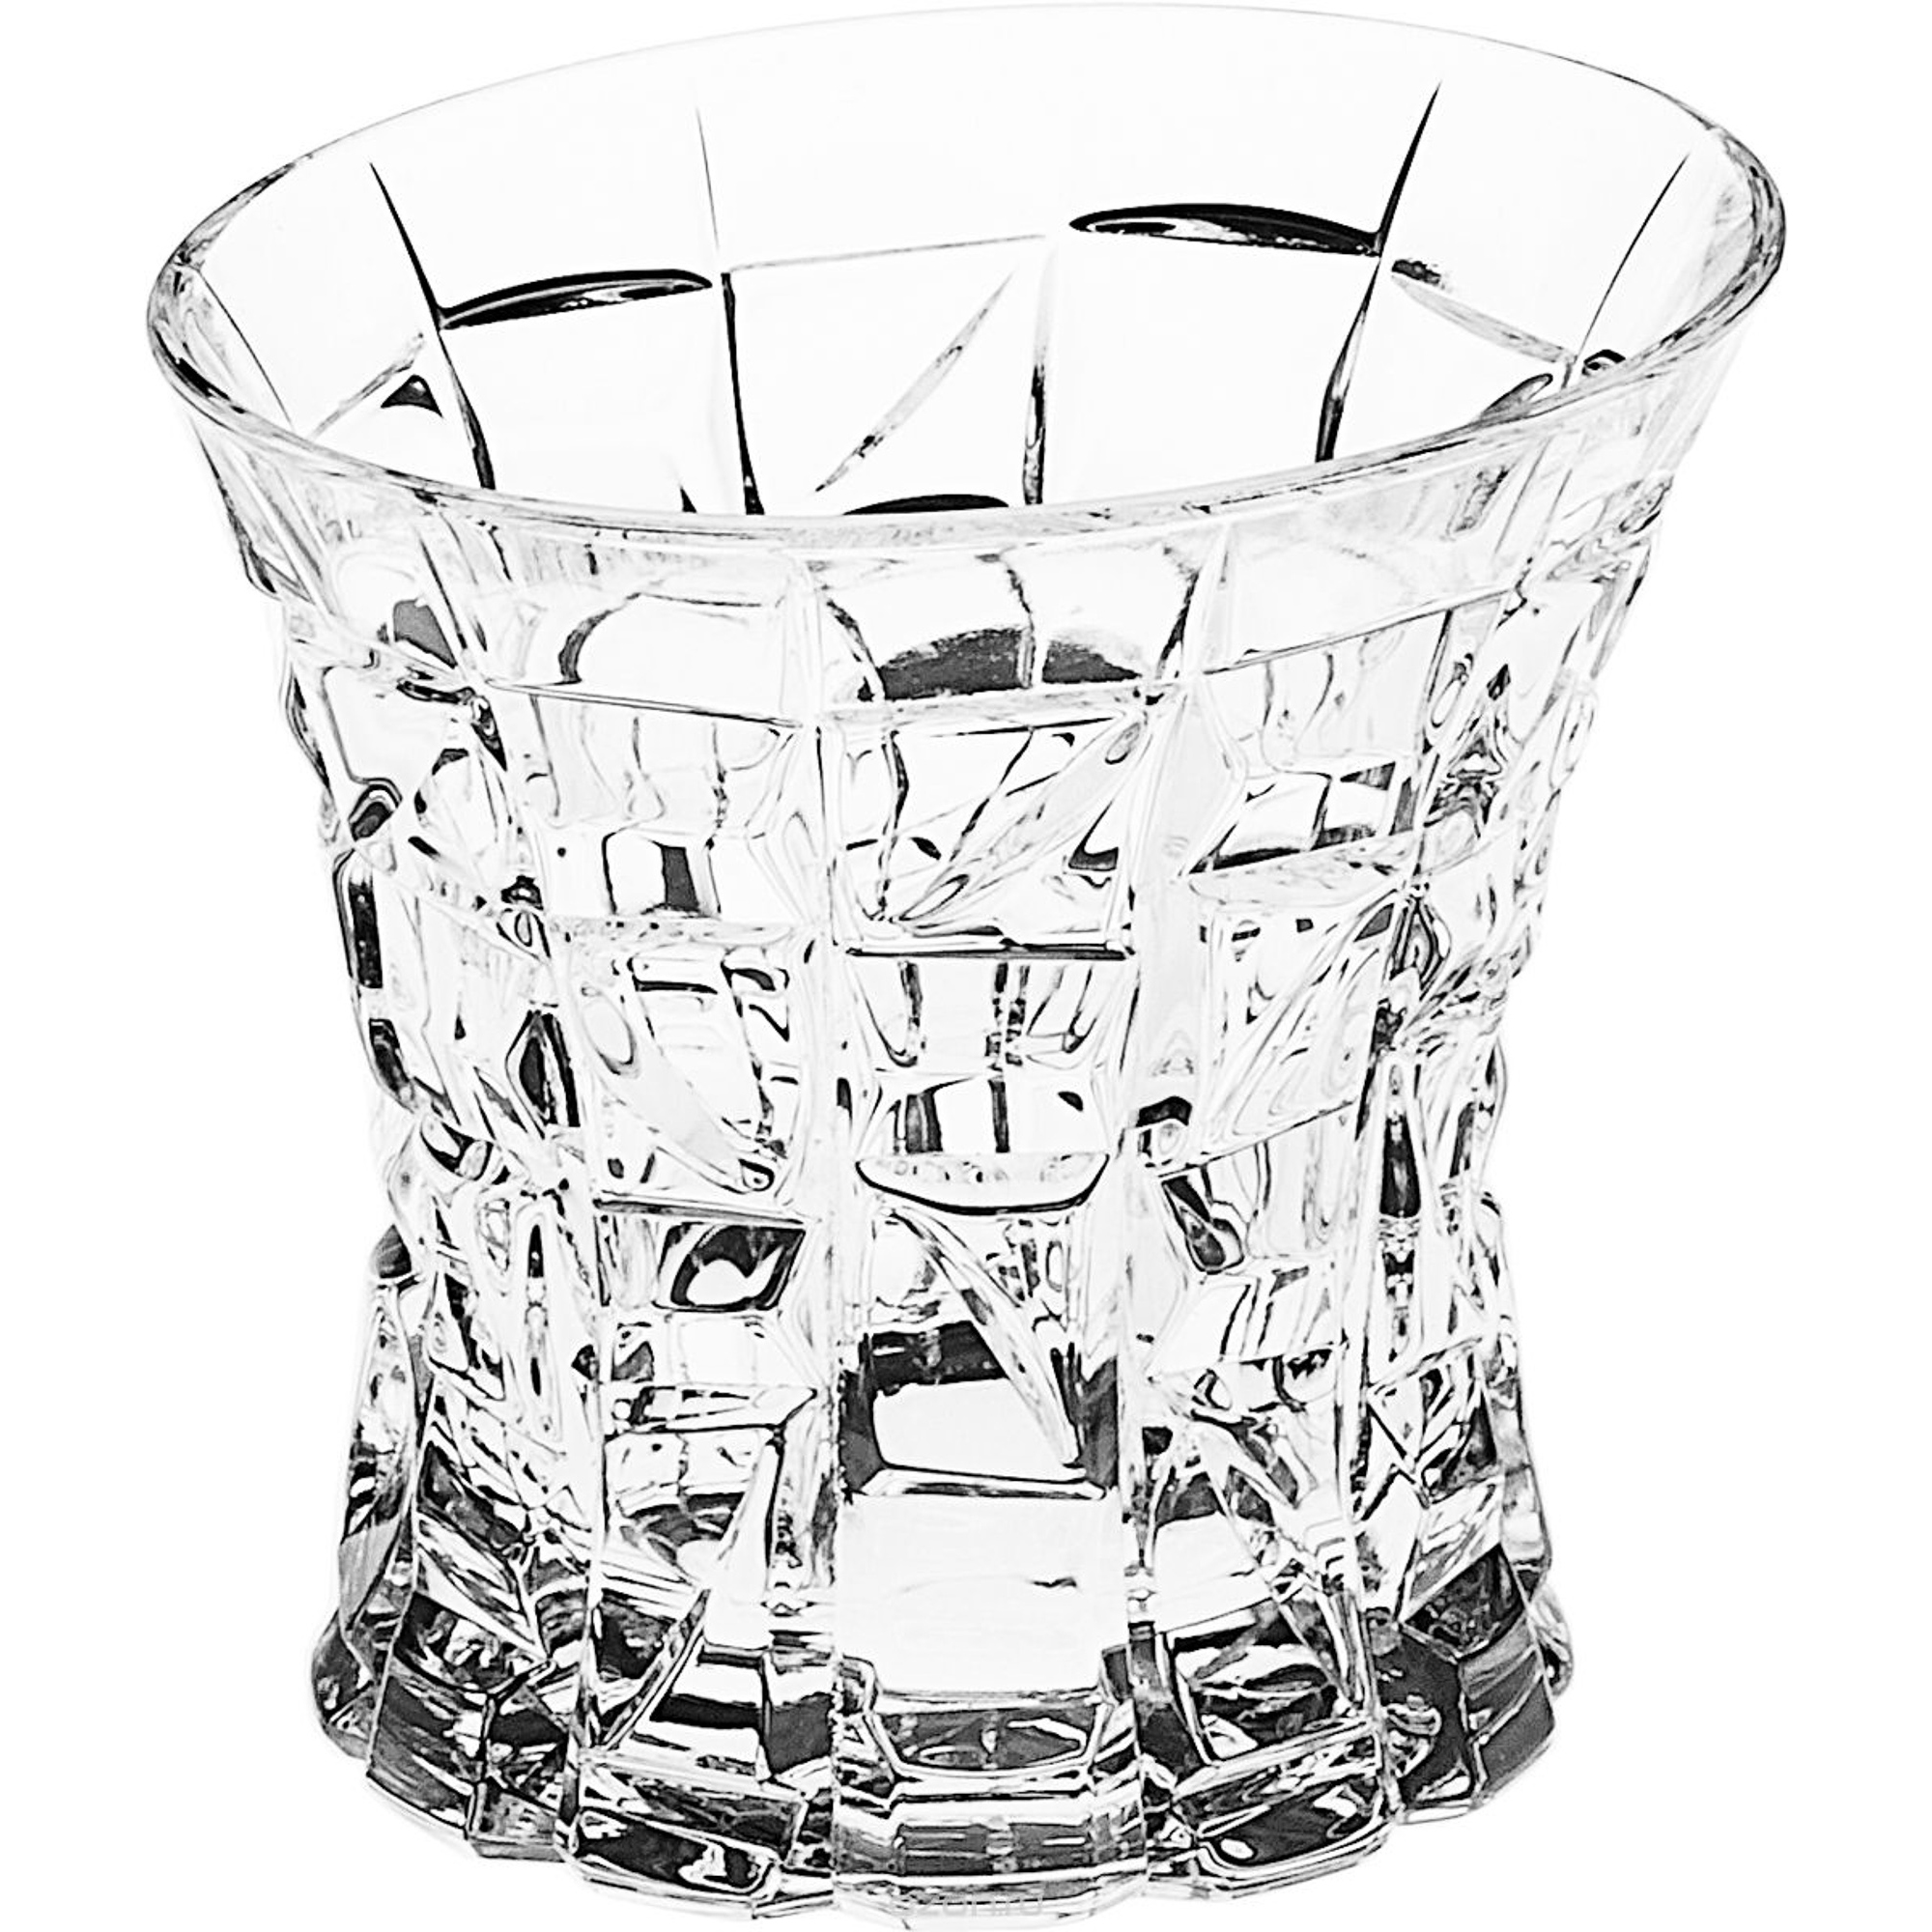 Набор стаканов Crystal Bohemia A.S. БПХ064 для виски, 6 штук по 200 мл